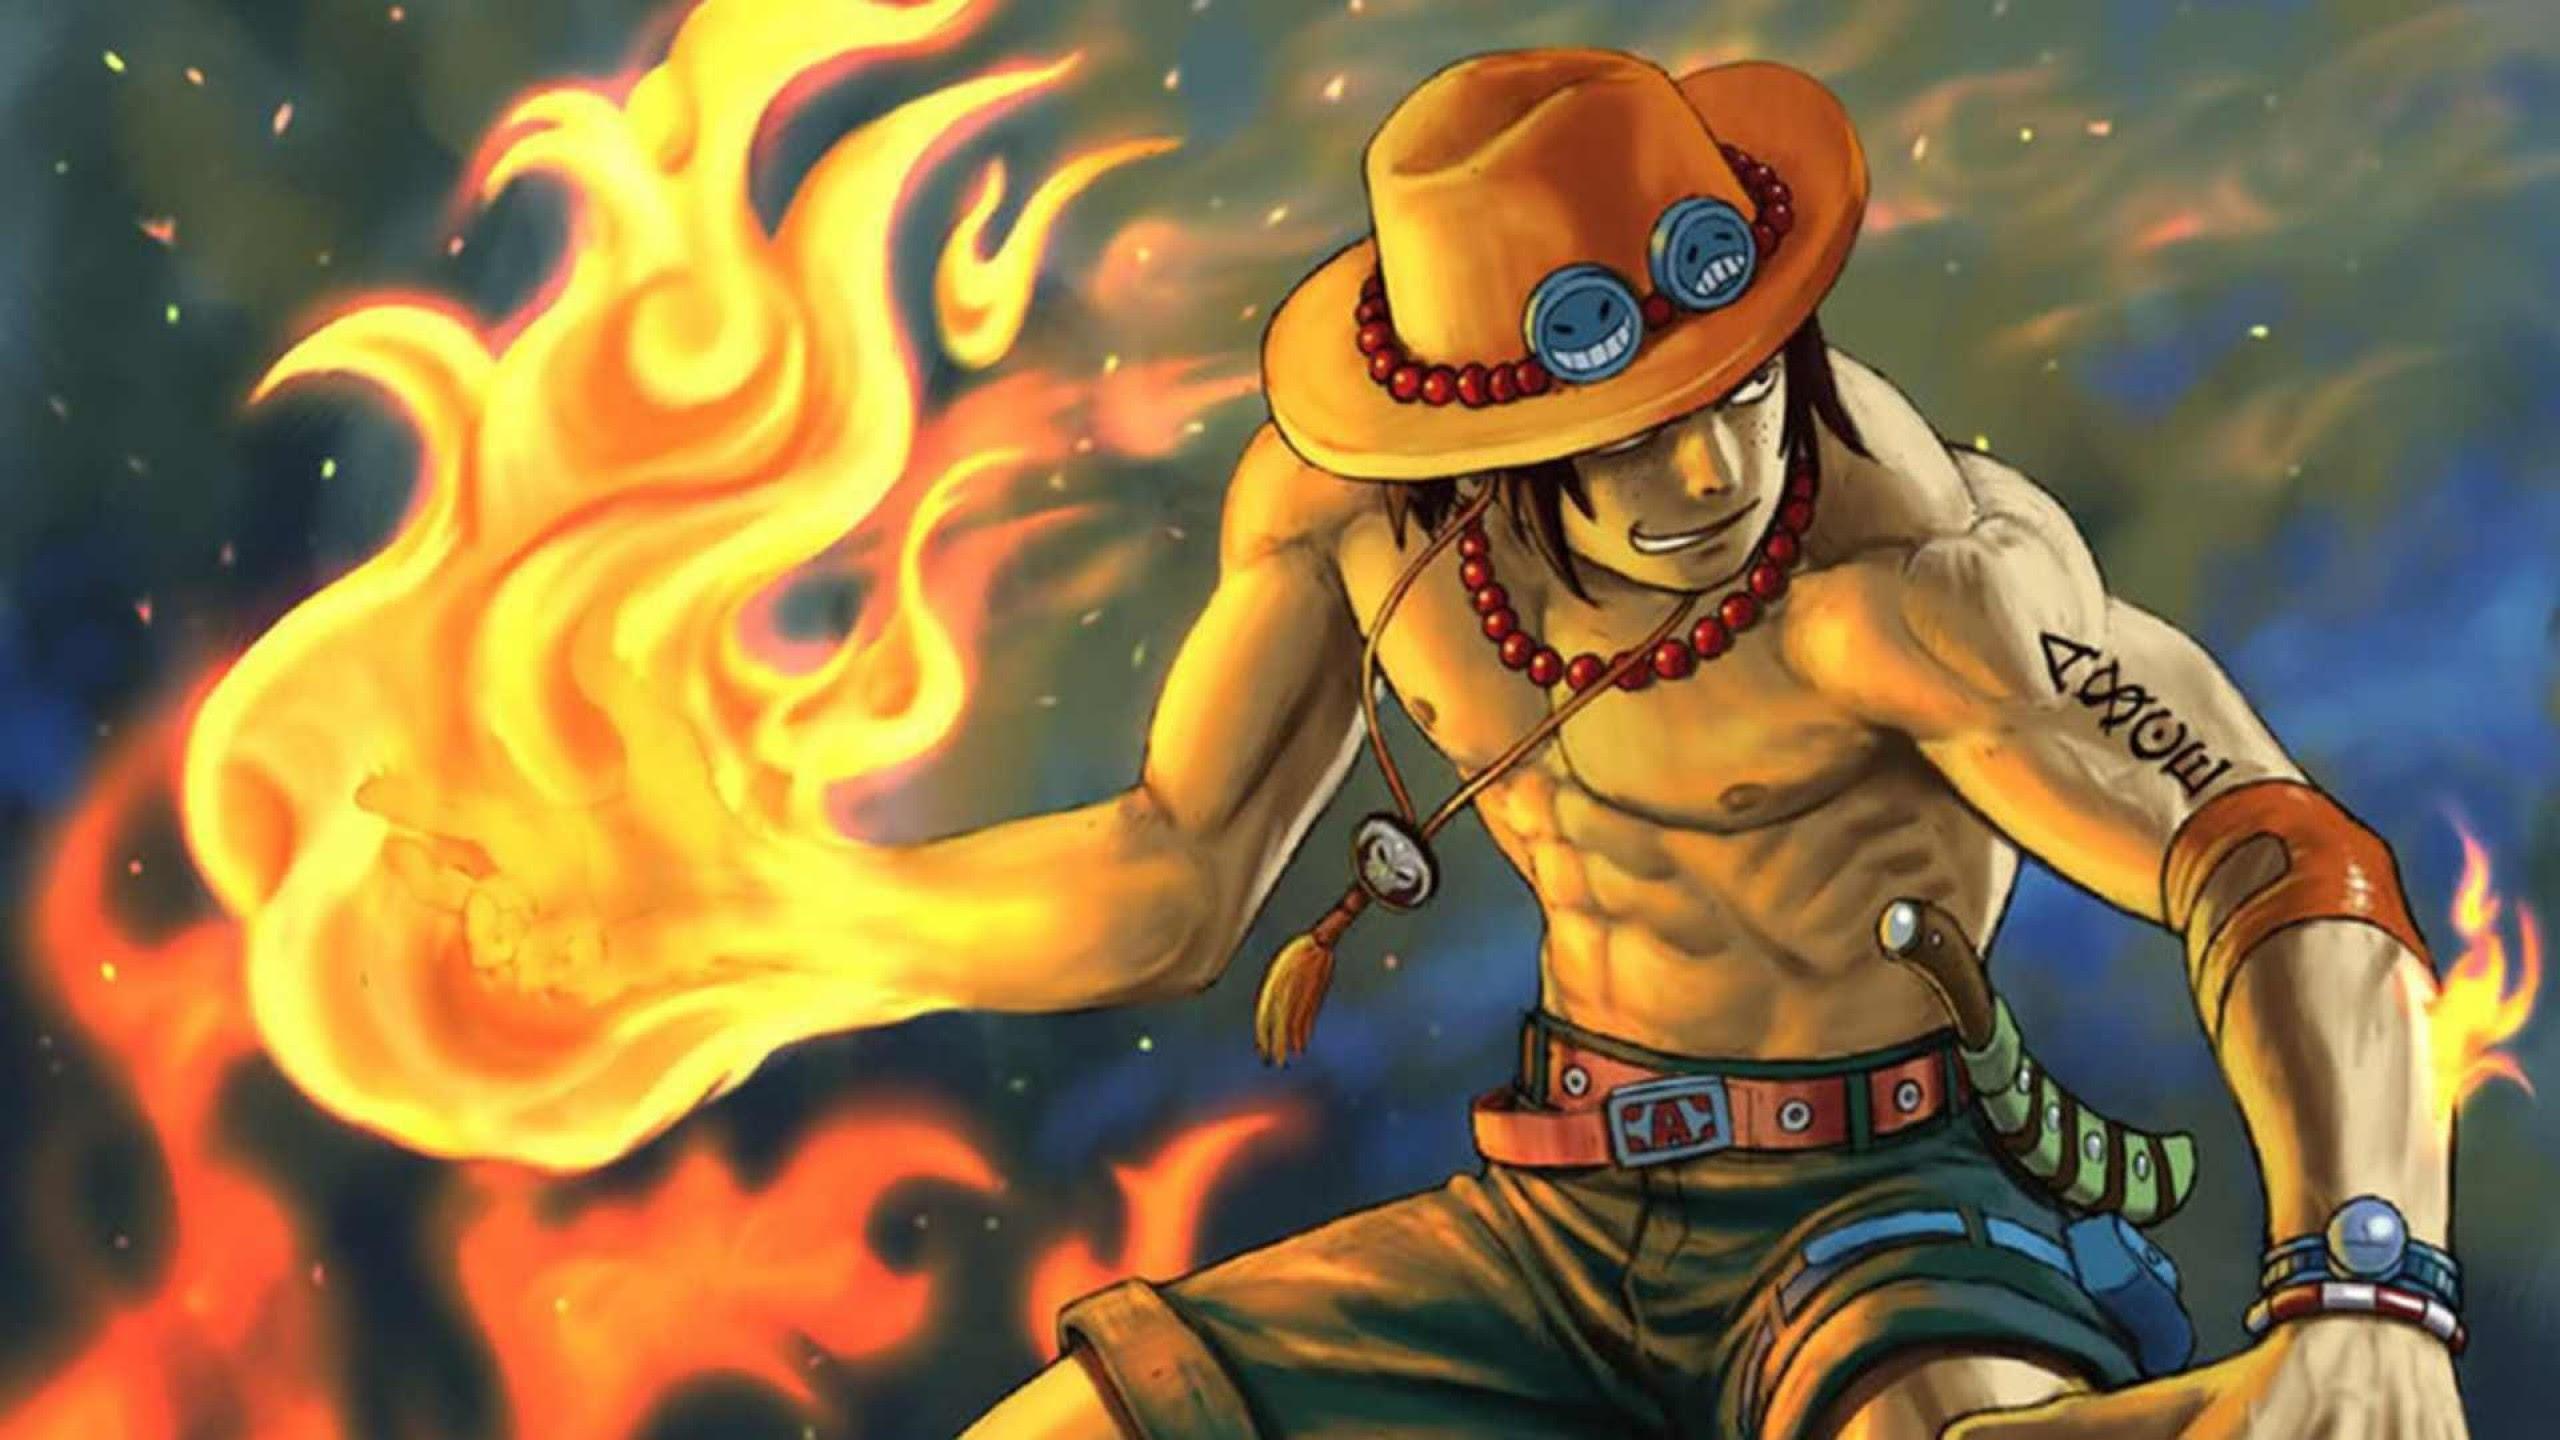 Download 6600 Koleksi Wallpaper Anime Hd One Piece Terbaik